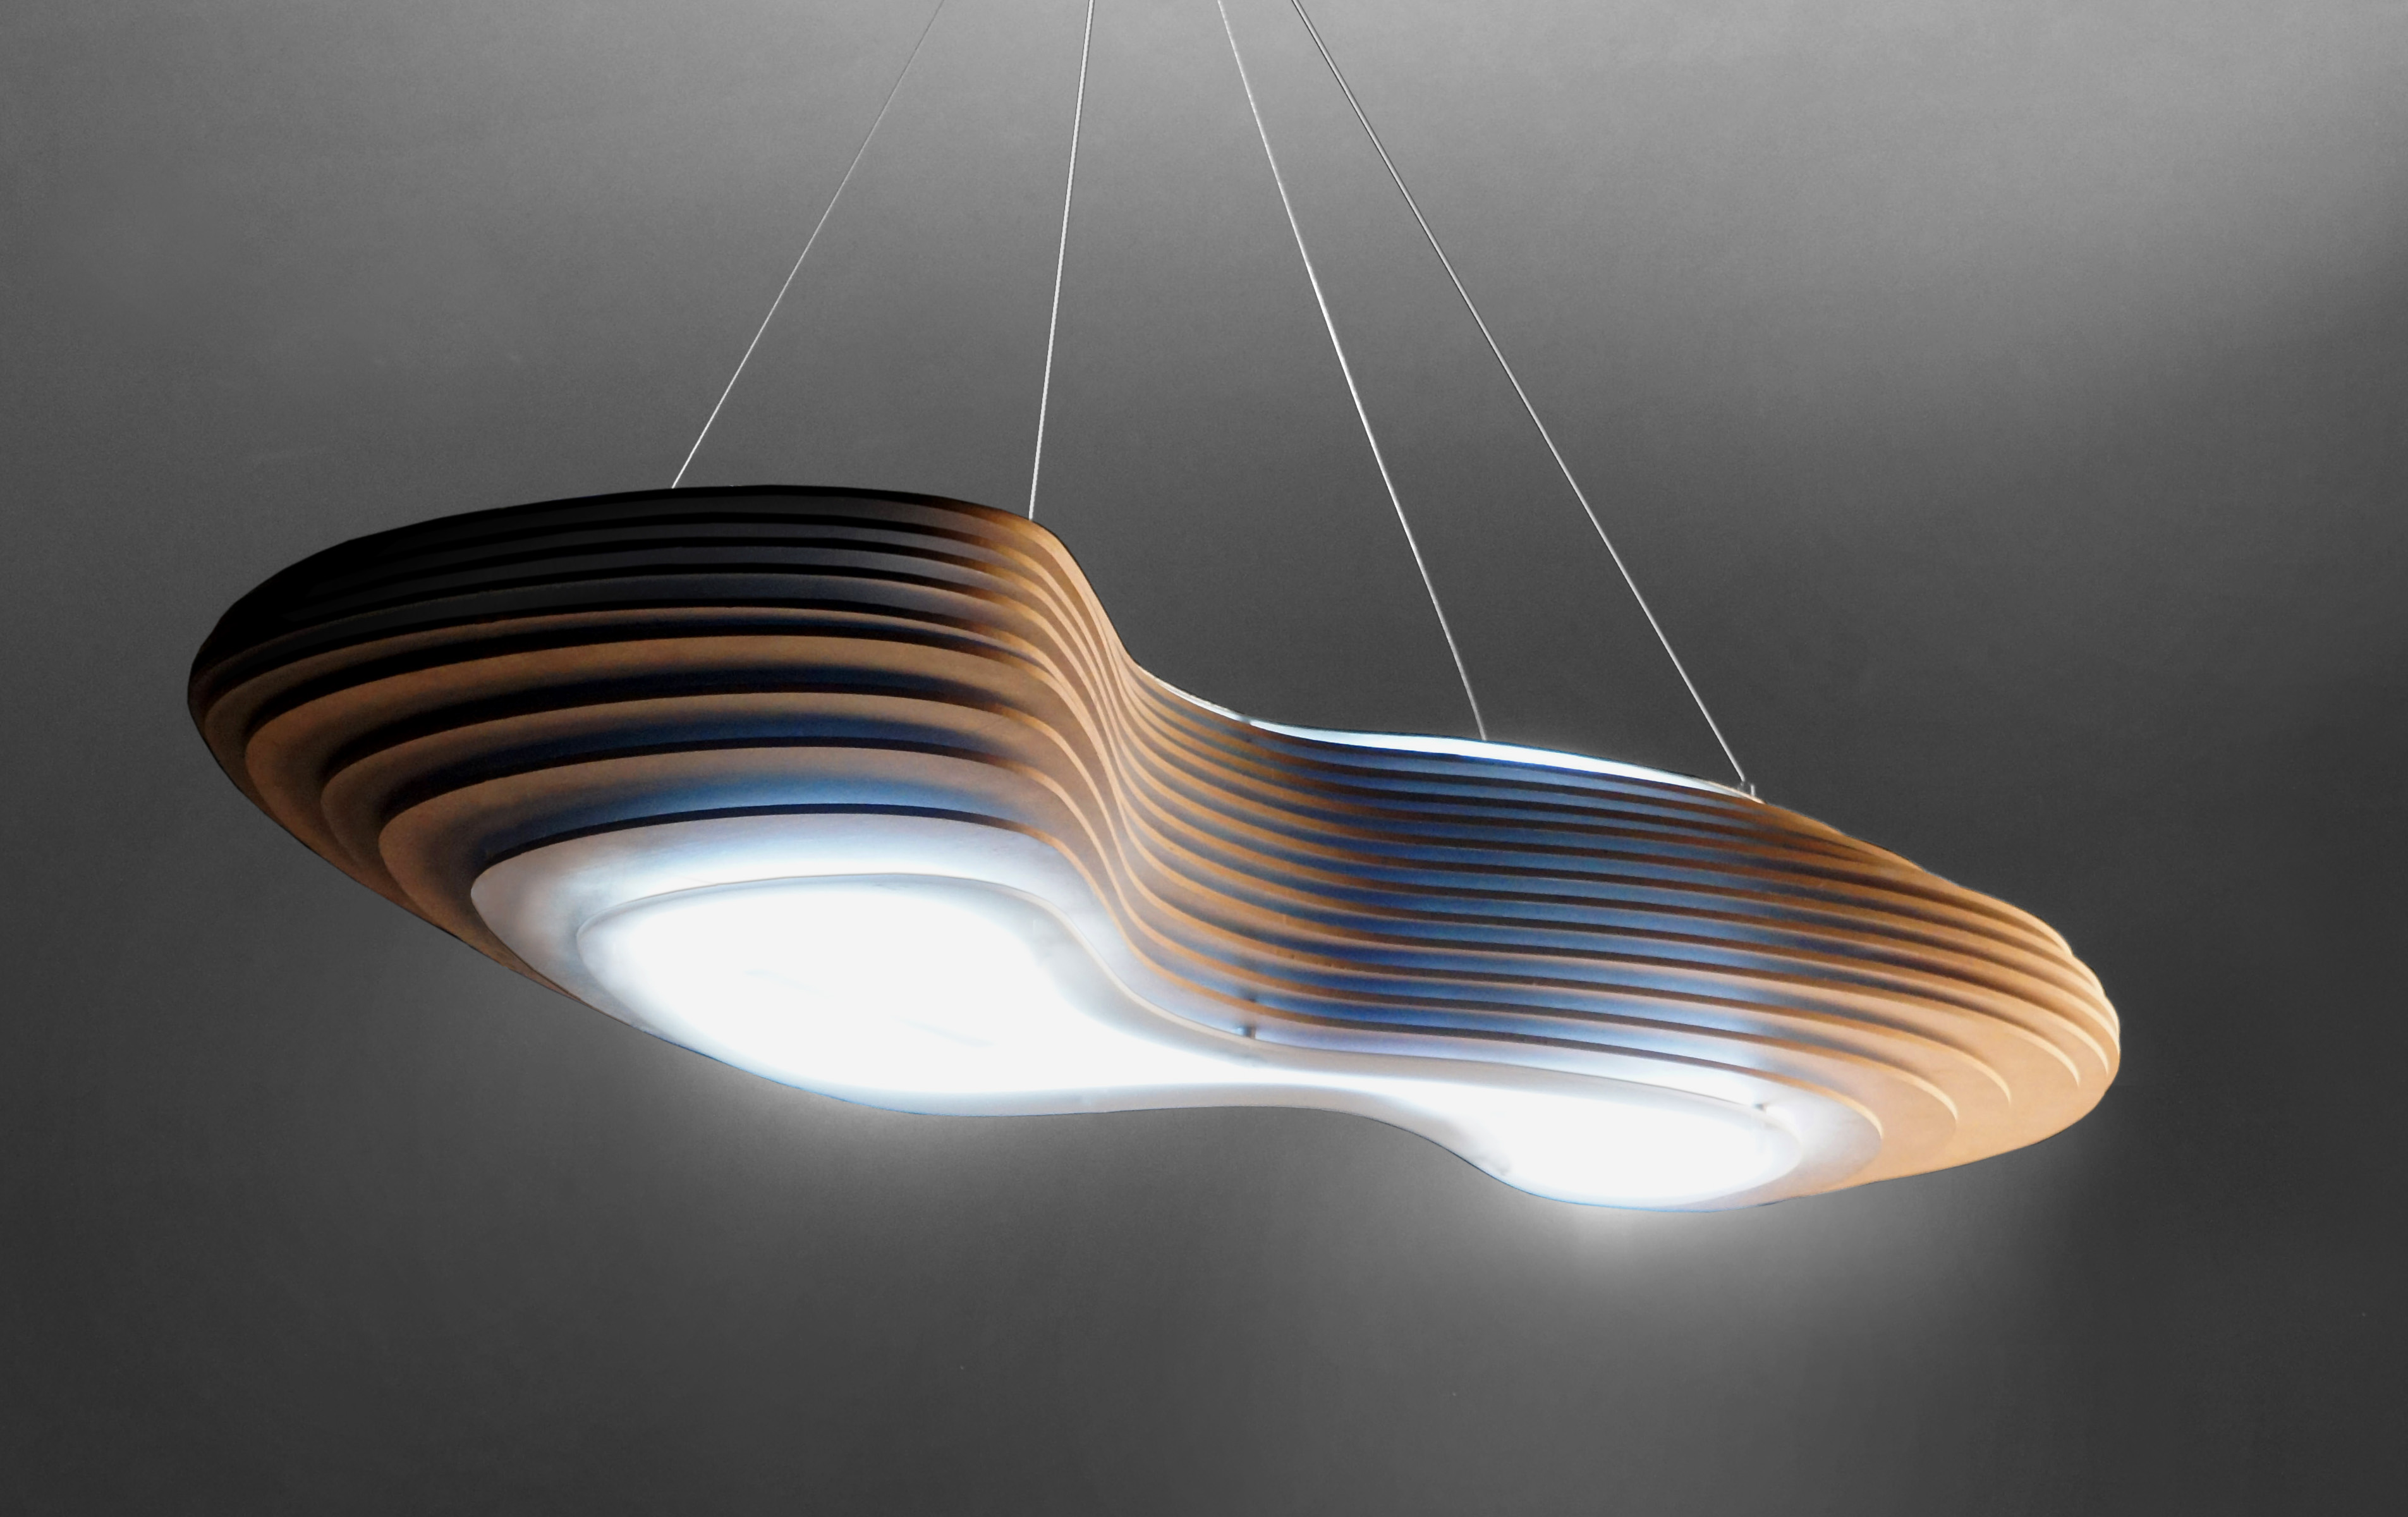 famous lighting designer. Famous Lighting Designer. Designer S Arkitexture